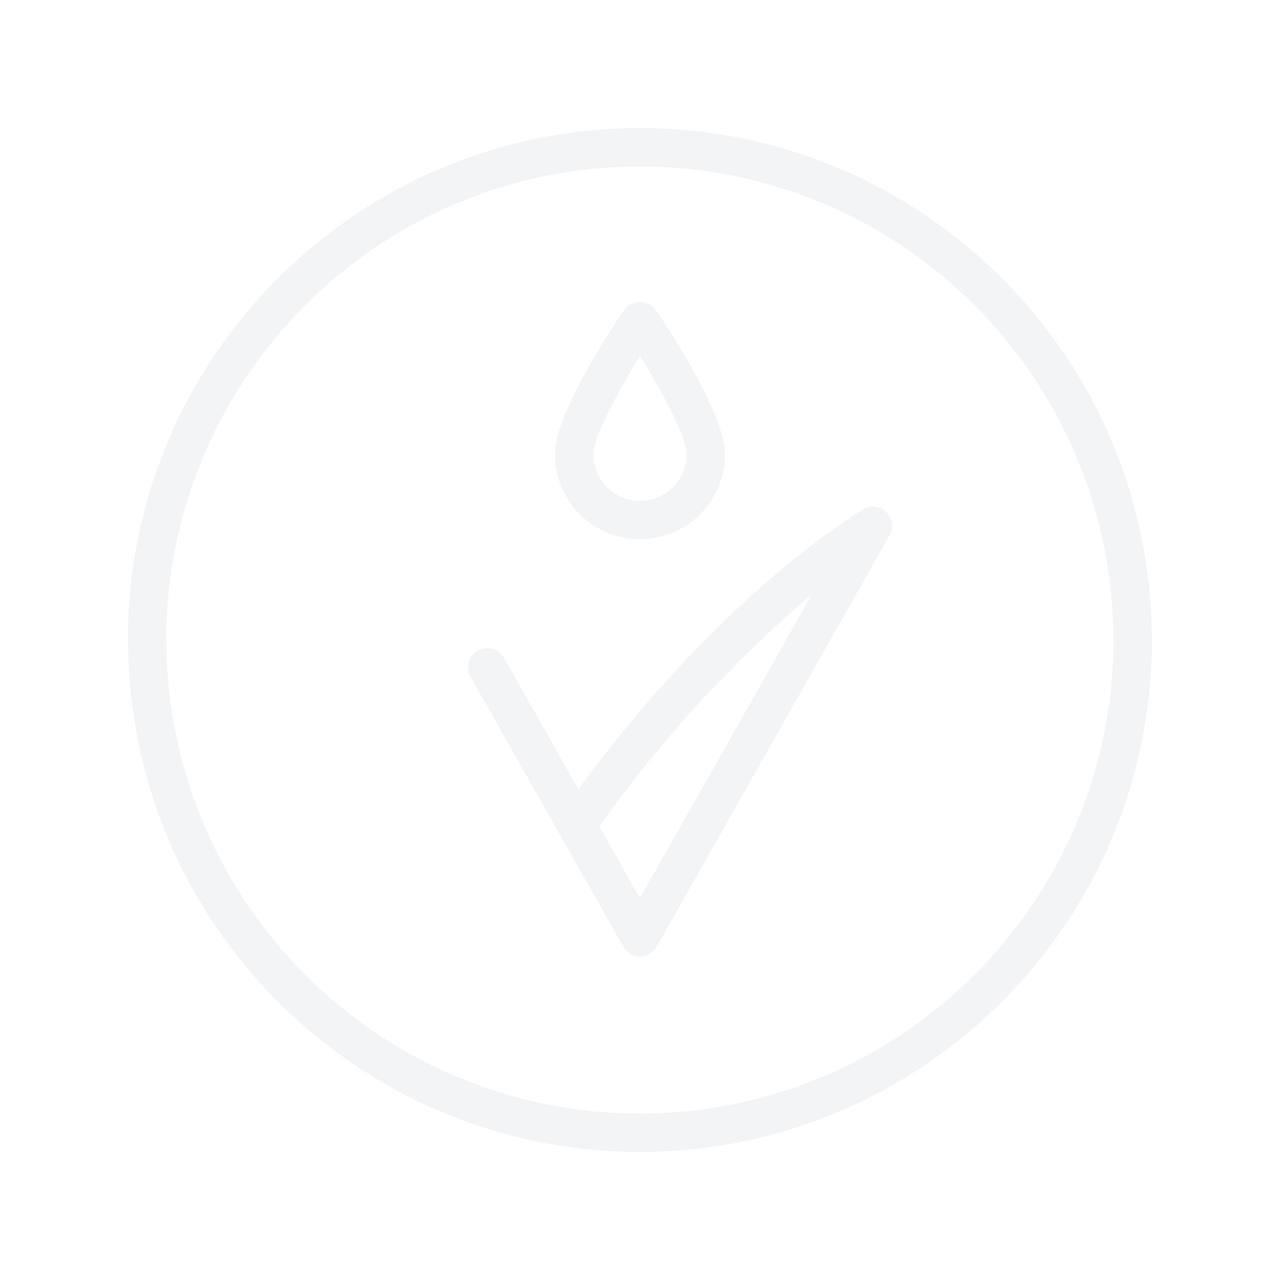 ELIZABETH ARDEN White Tea Cream Deodorant дезодорант для тела 40ml